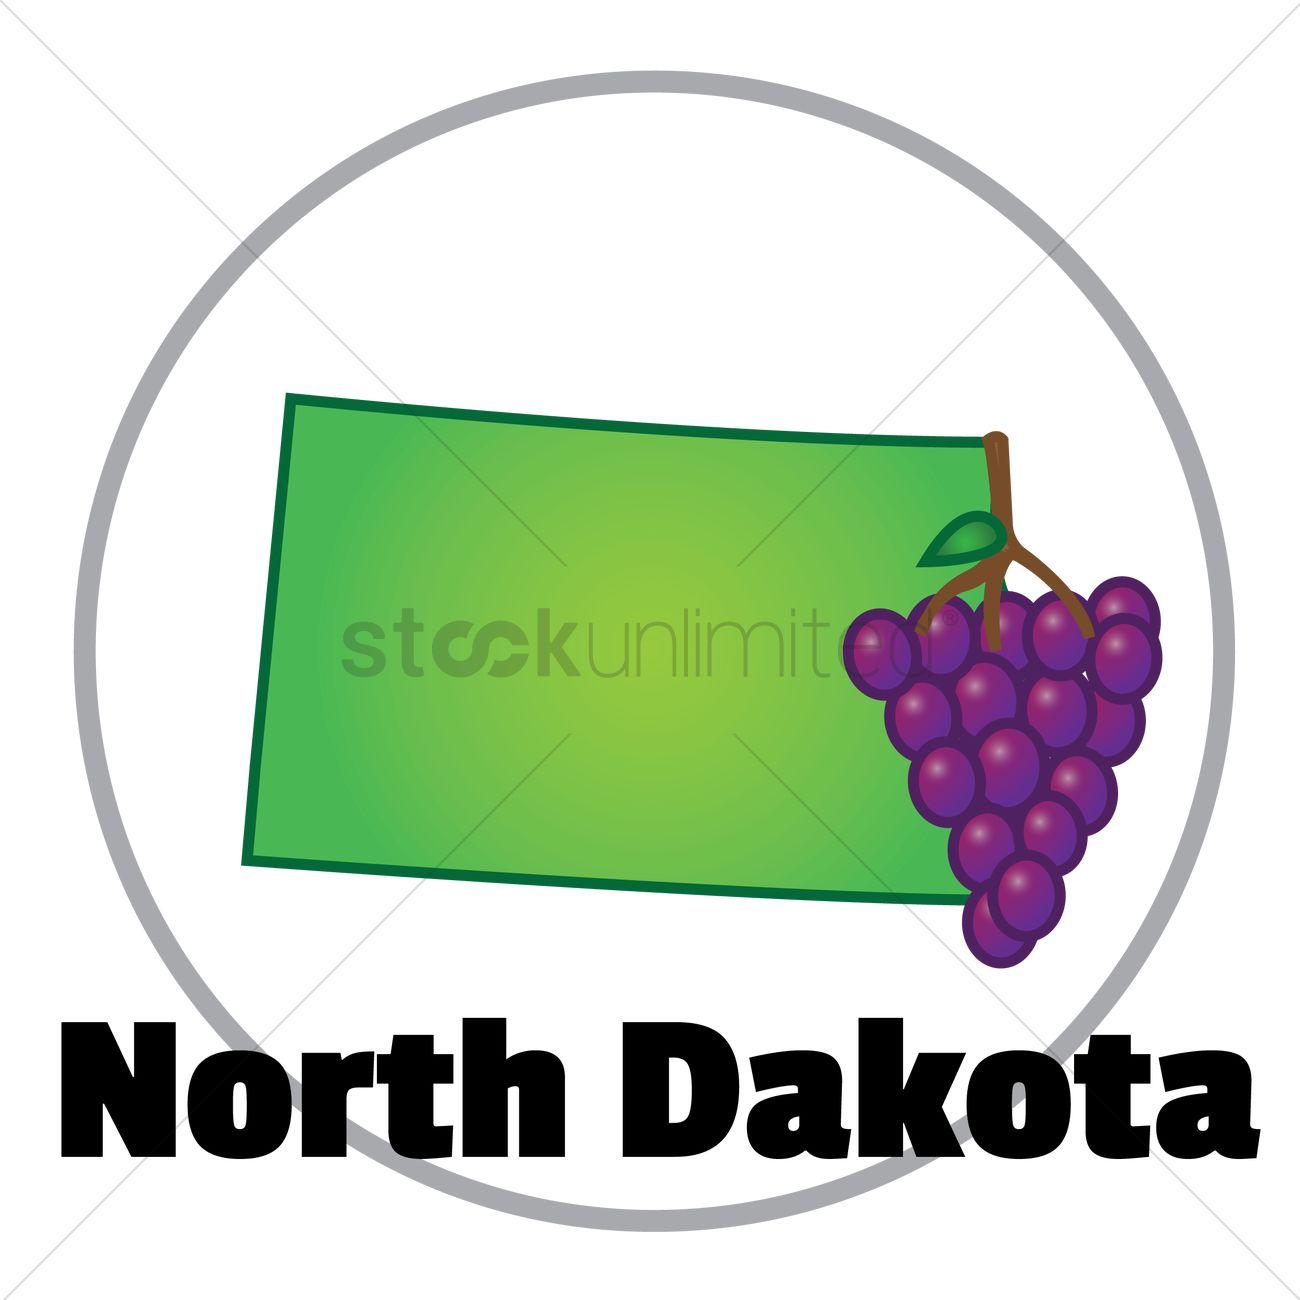 North dakota state map Vector Image - 1556402 | StockUnlimited